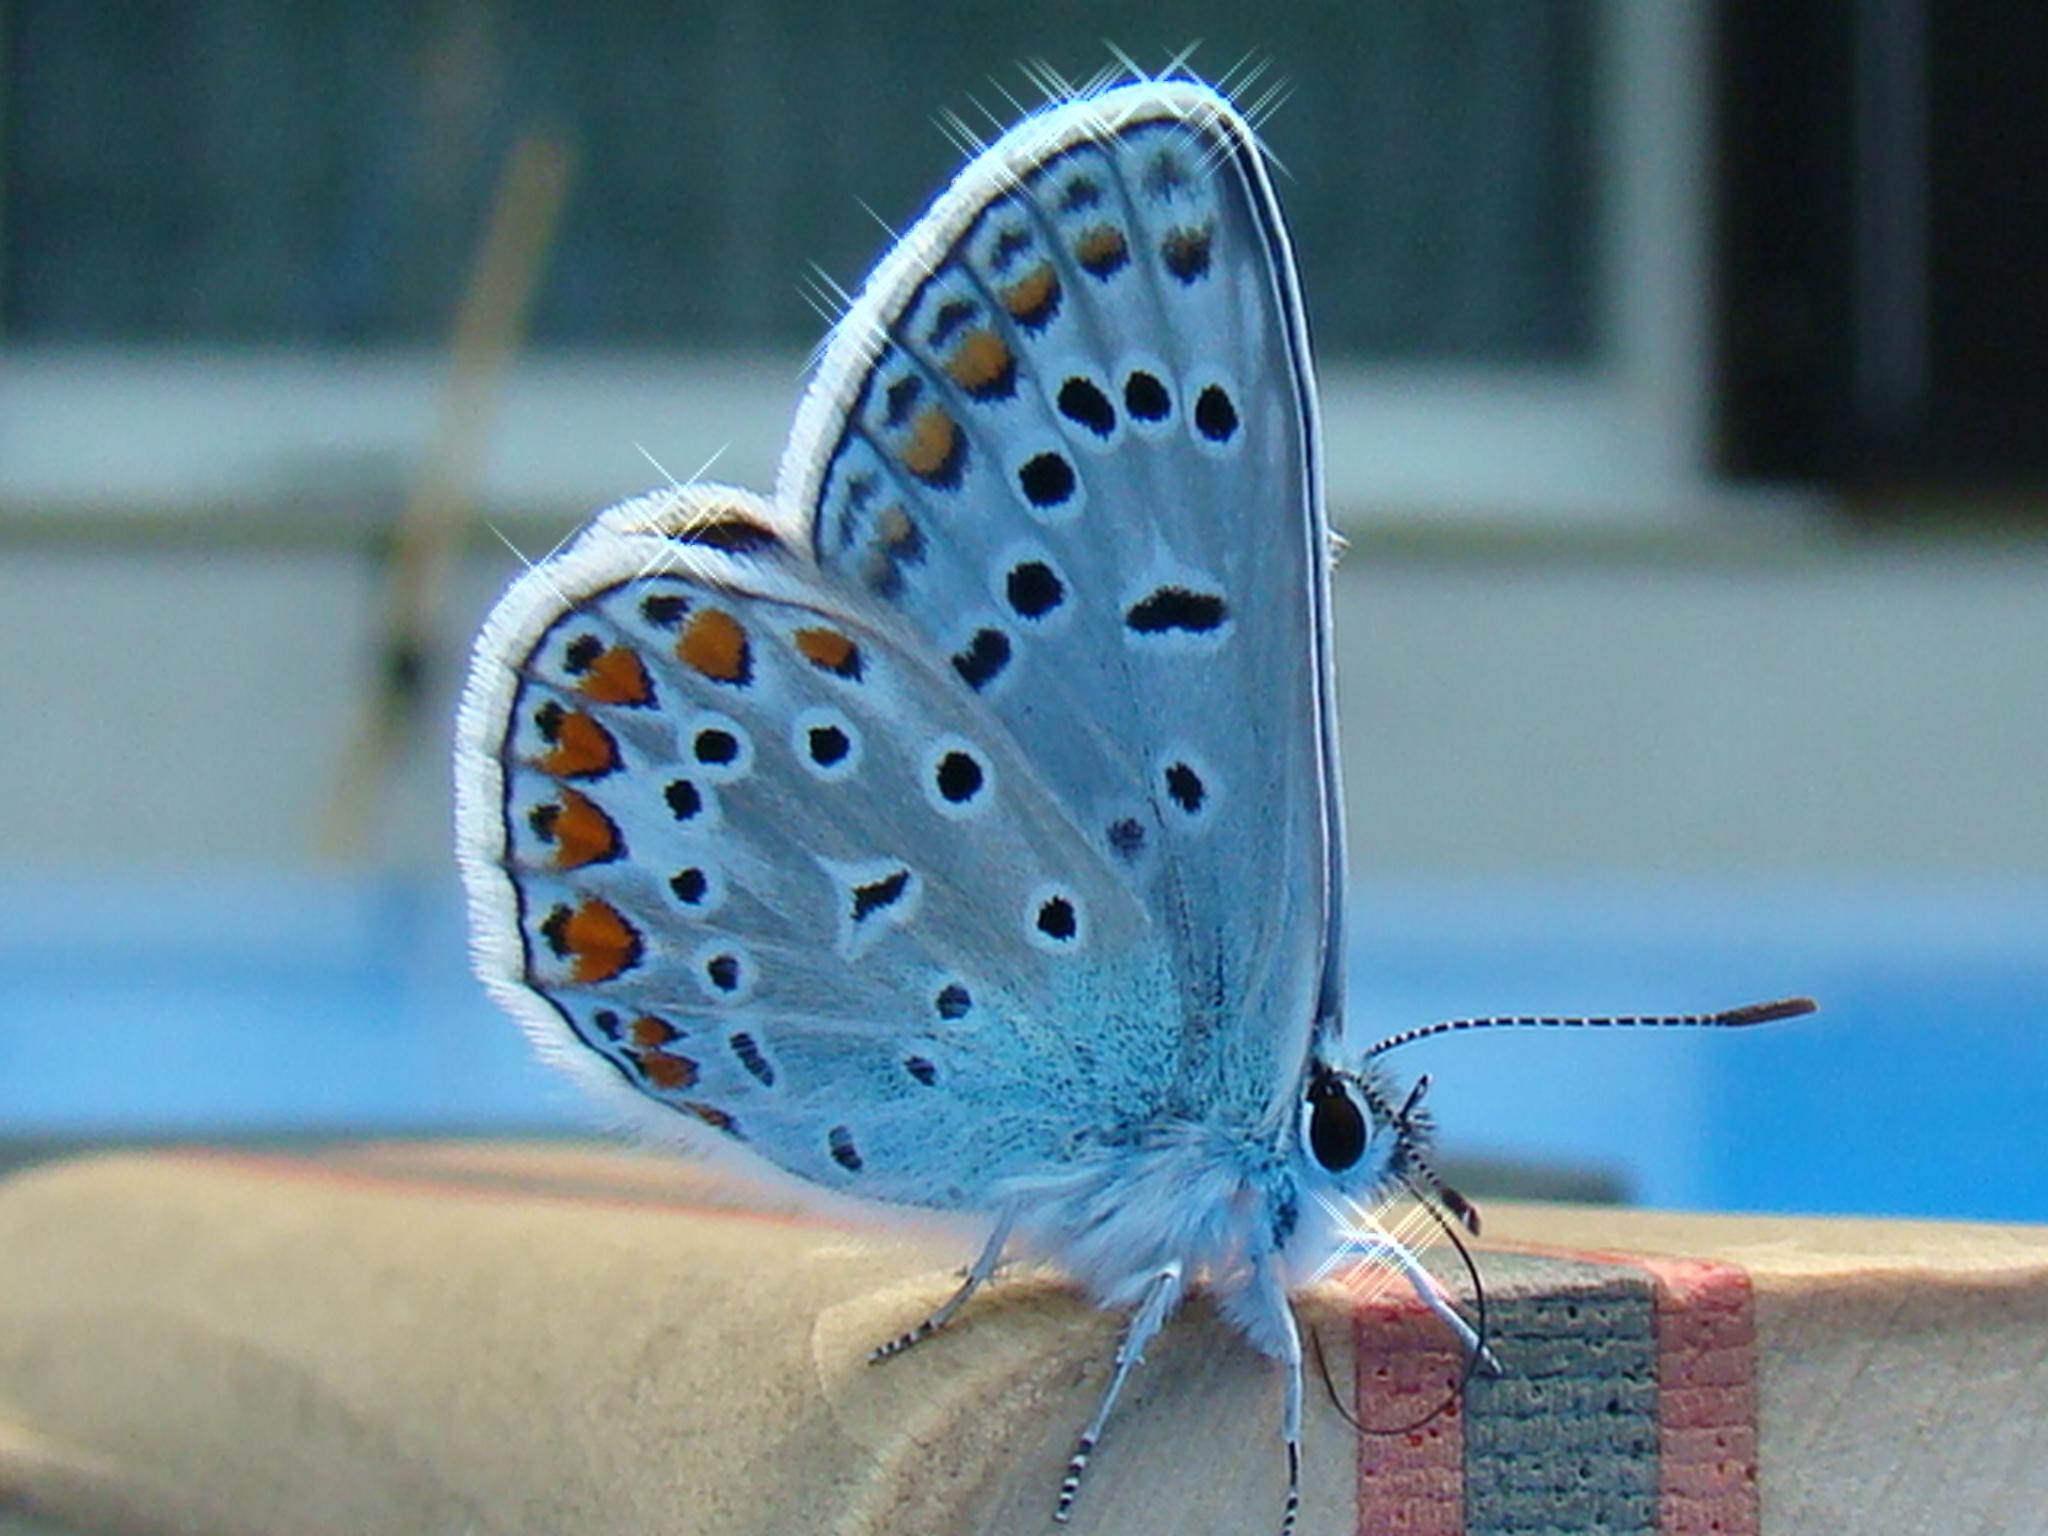 https://i1.wp.com/upload.wikimedia.org/wikipedia/commons/c/c0/Beautiful_butterfly.jpg